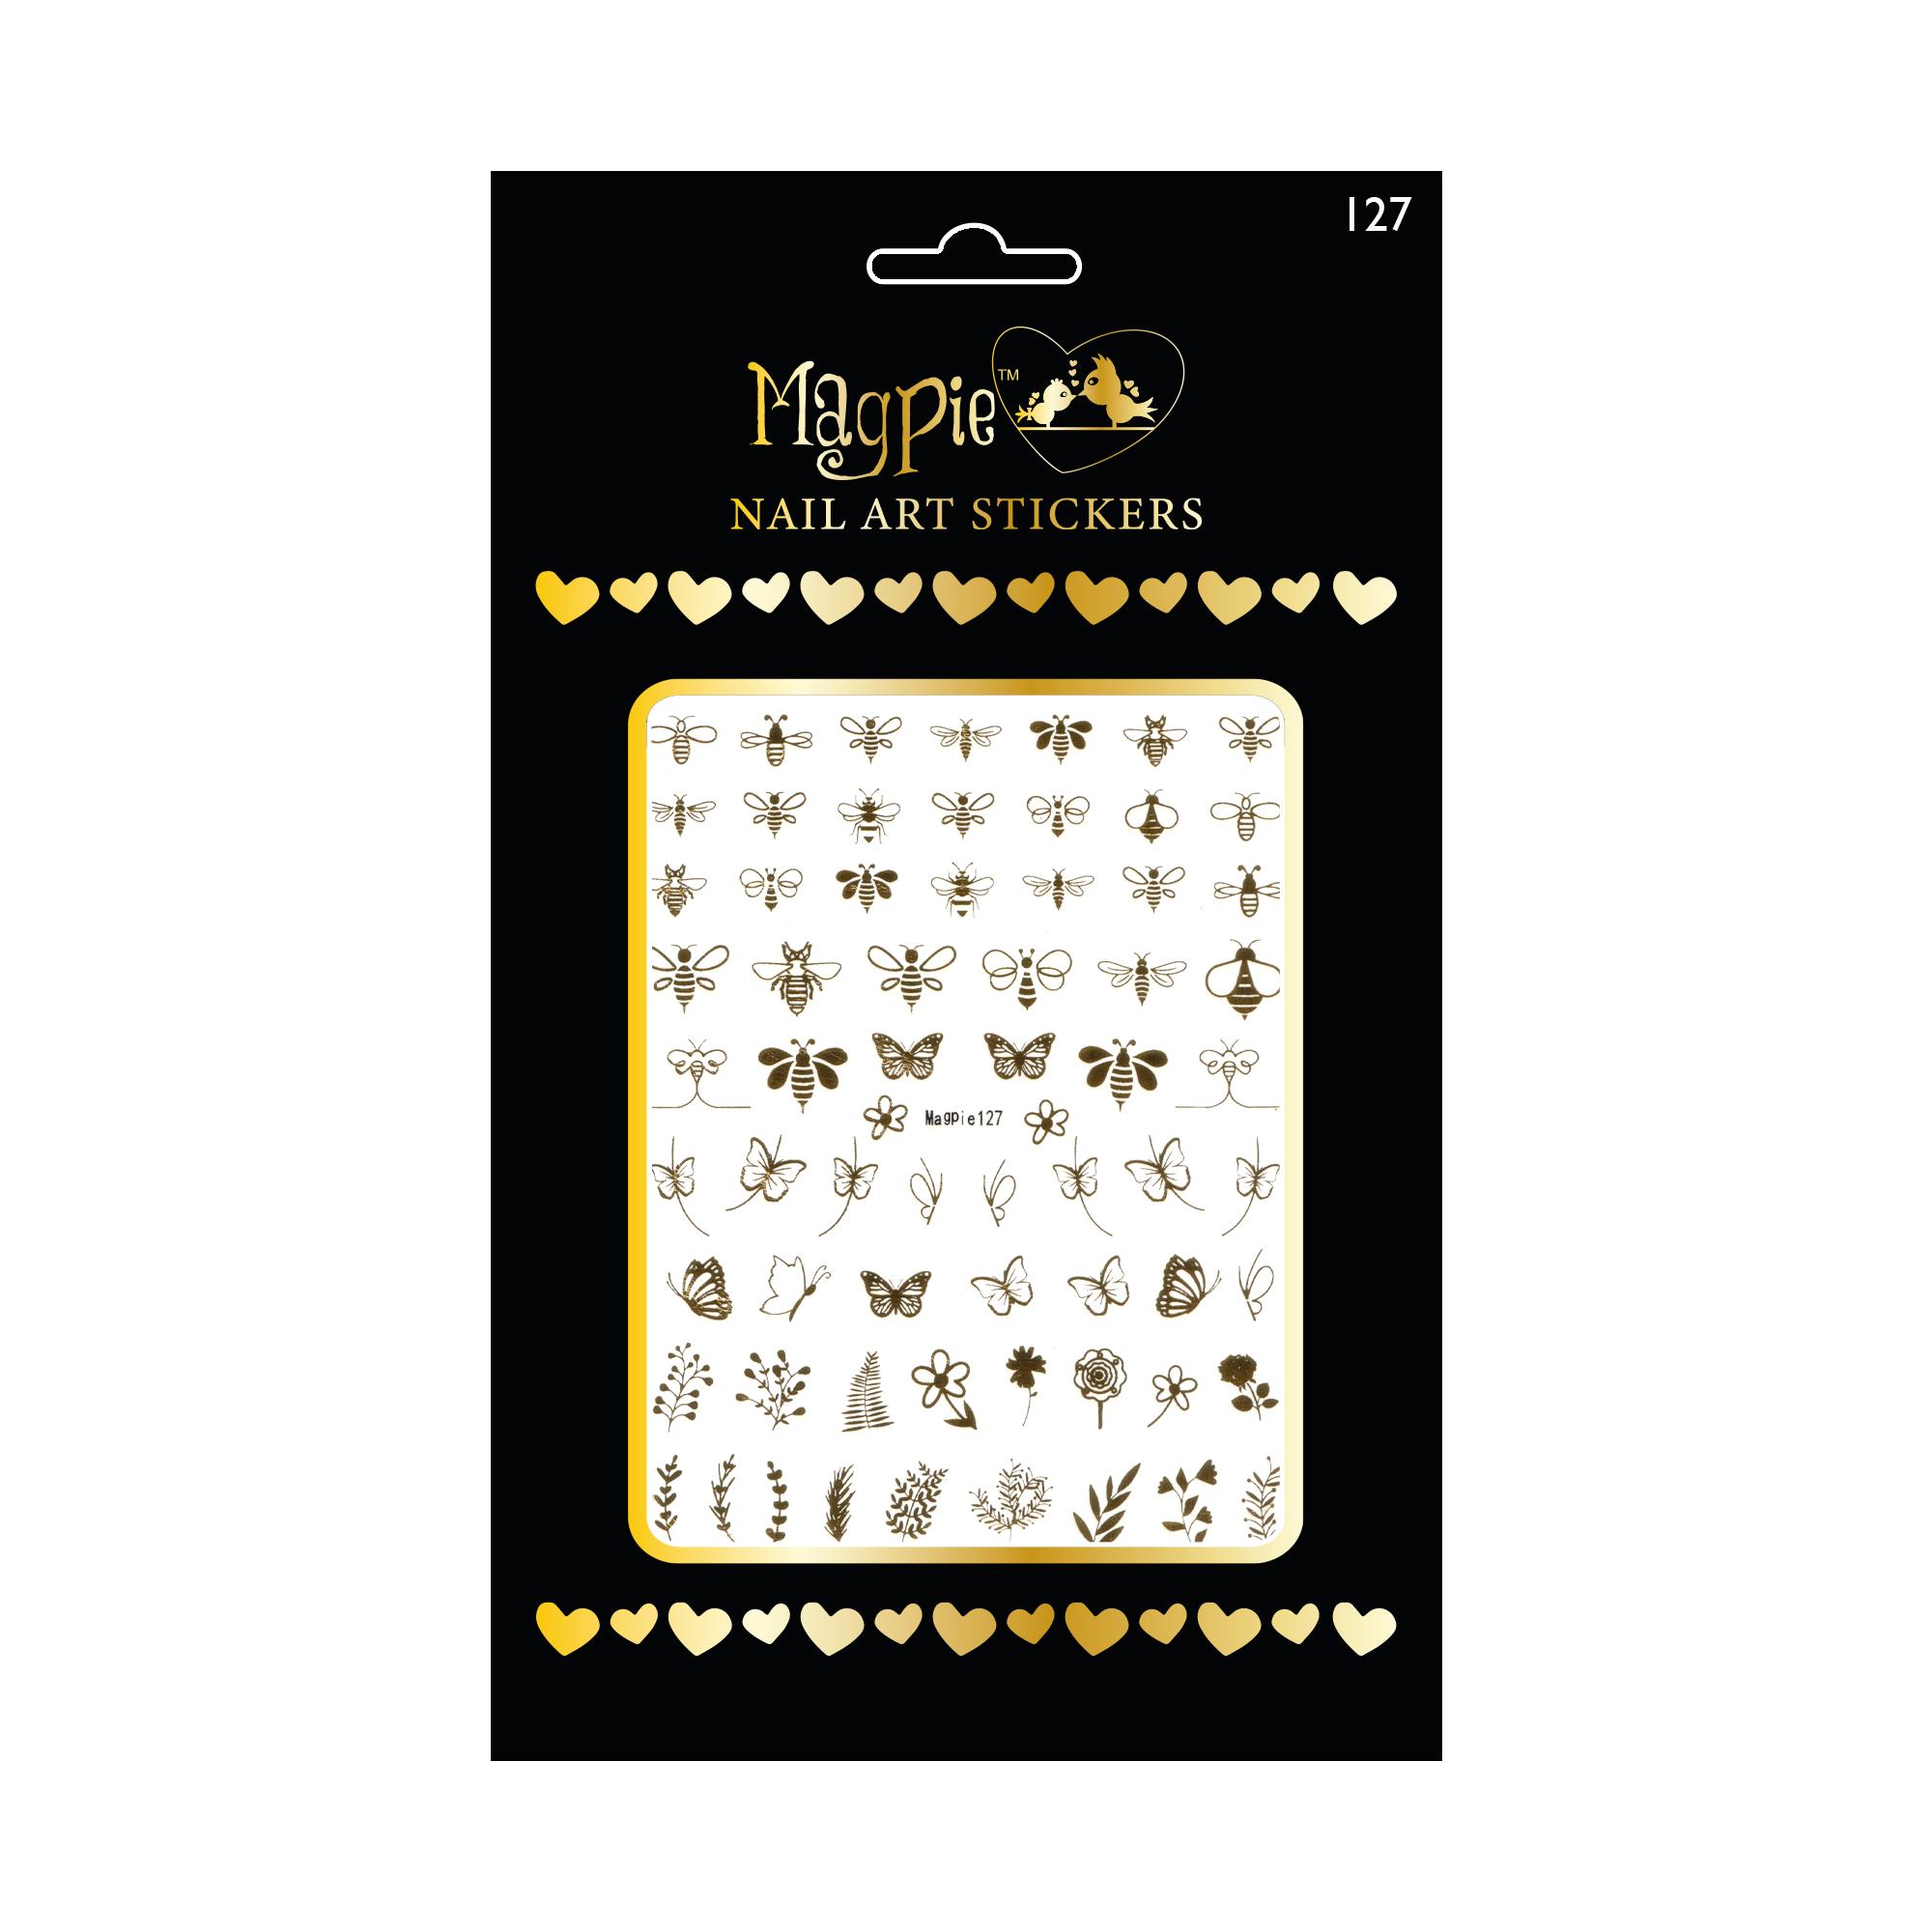 Magpie 127 stickers